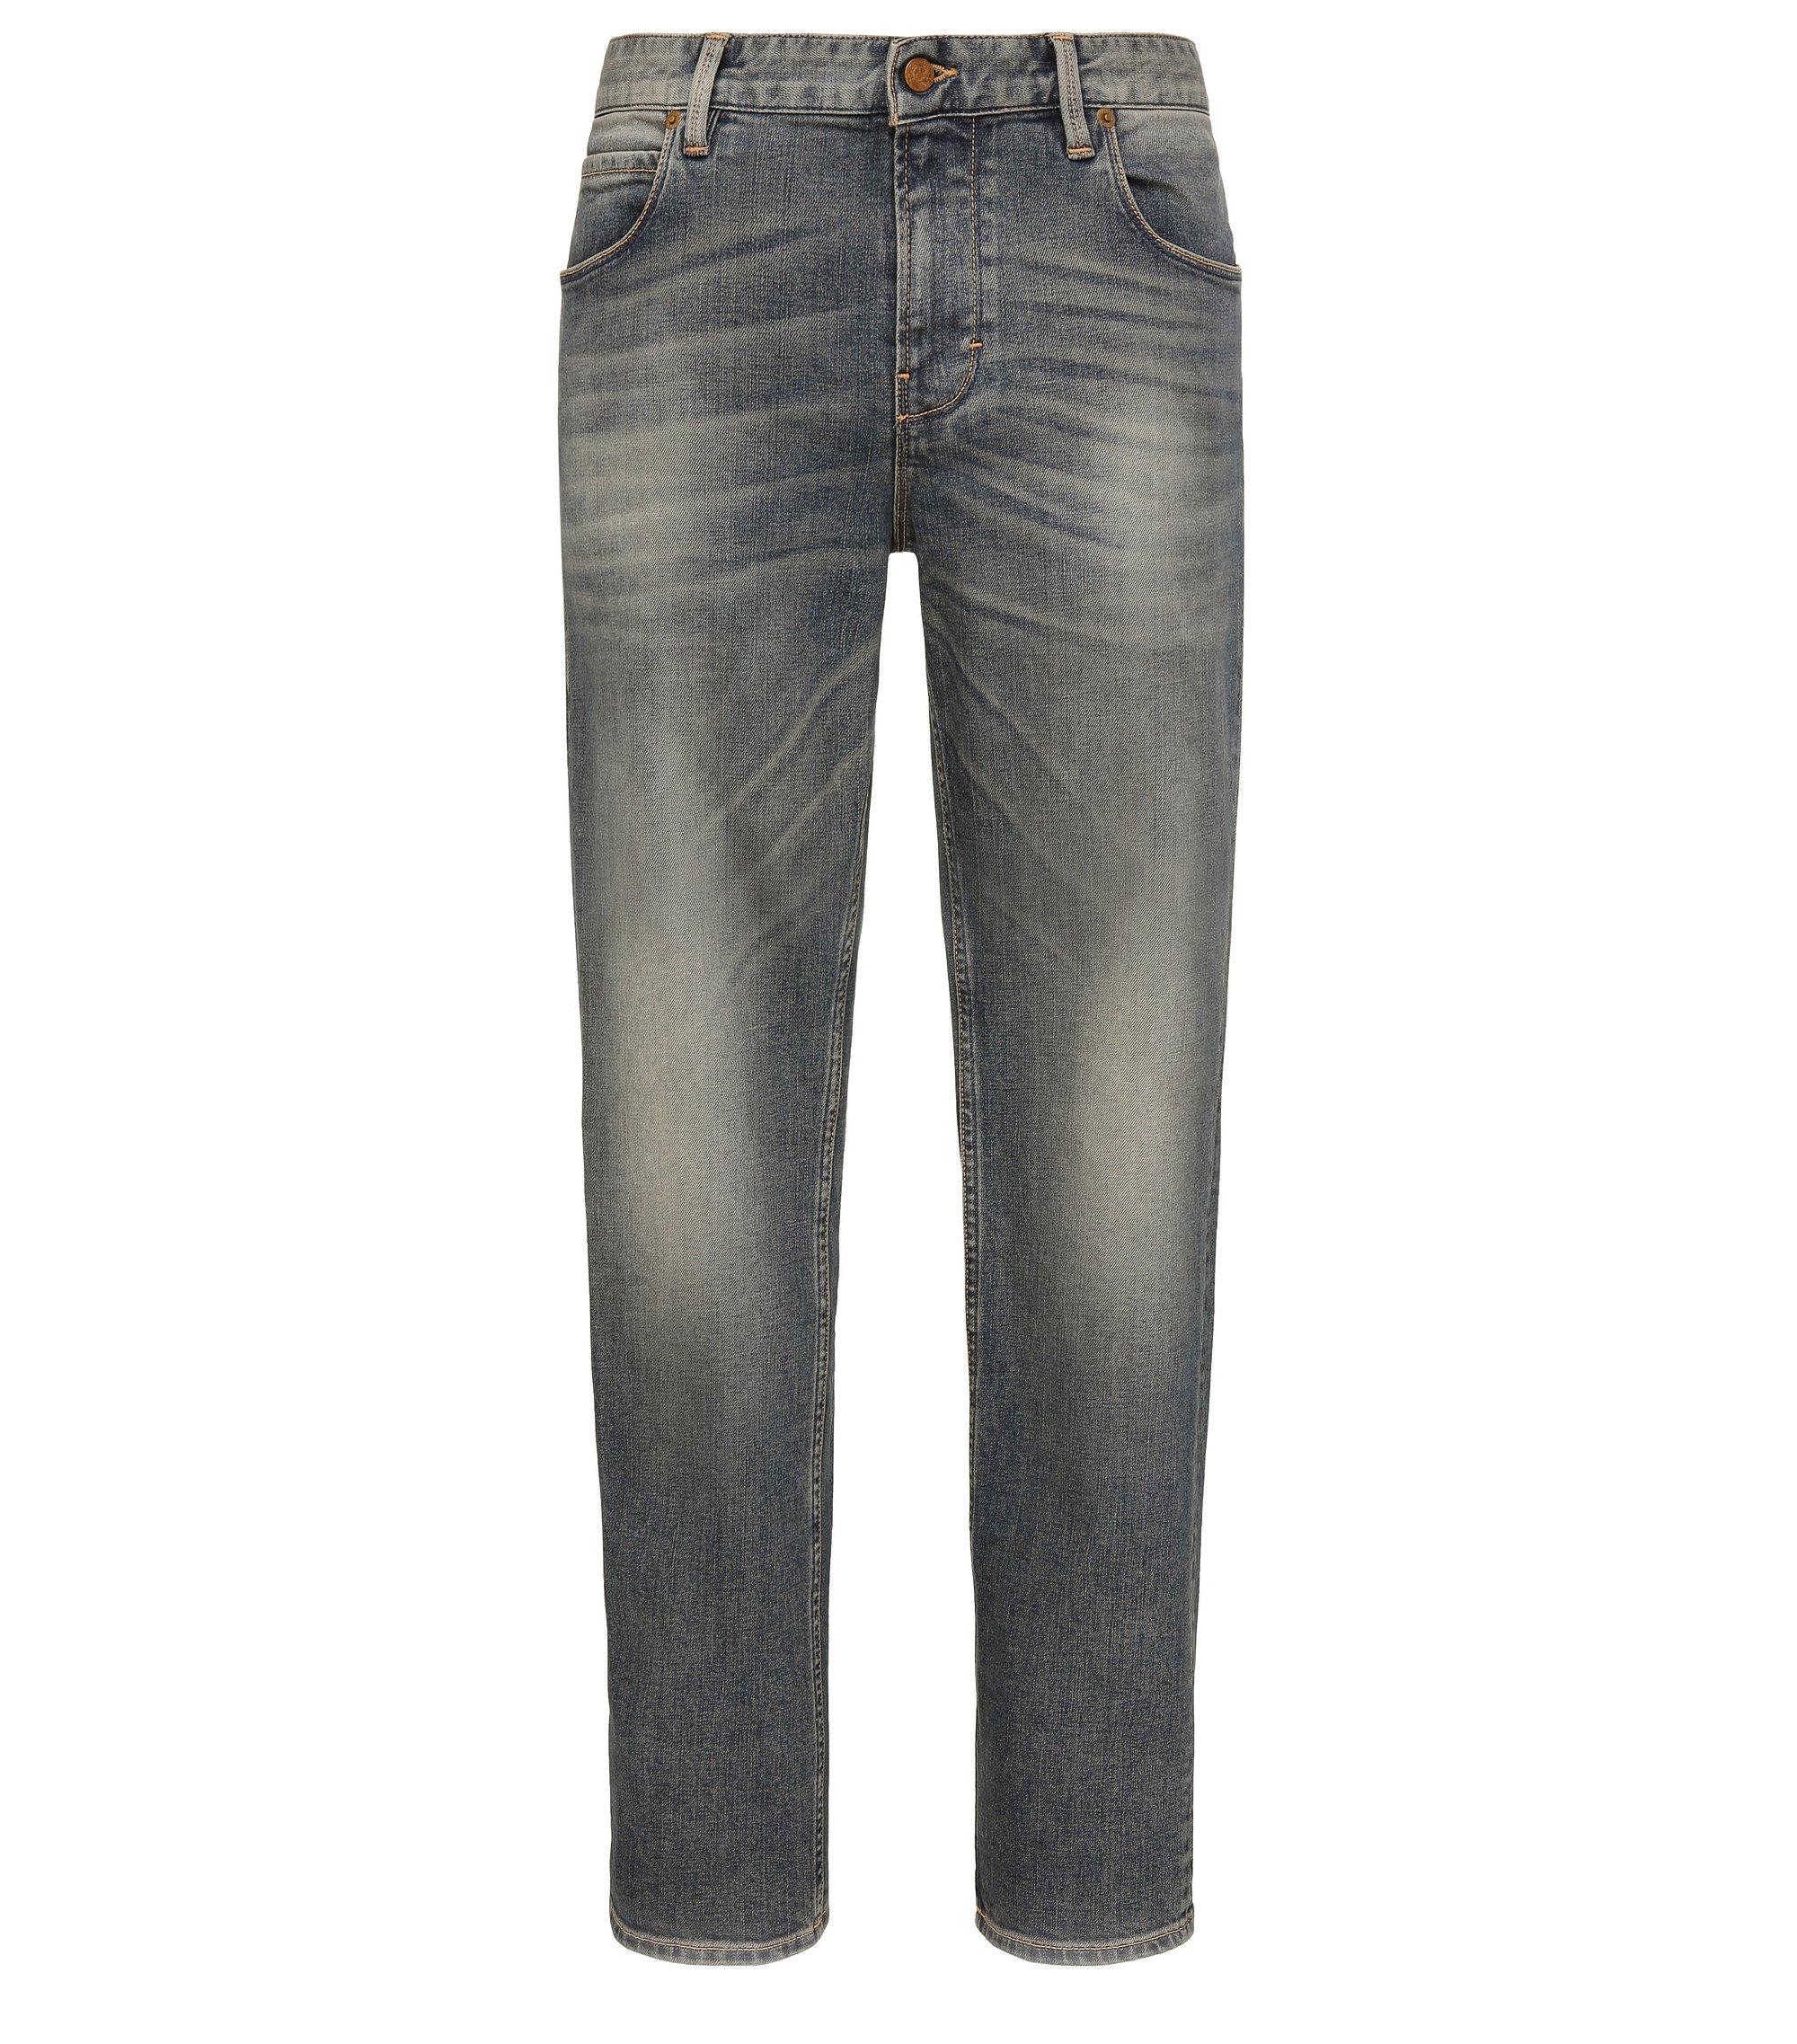 13 oz Stretch Cotton Jeans, Slim Fit | Orange63, Blue